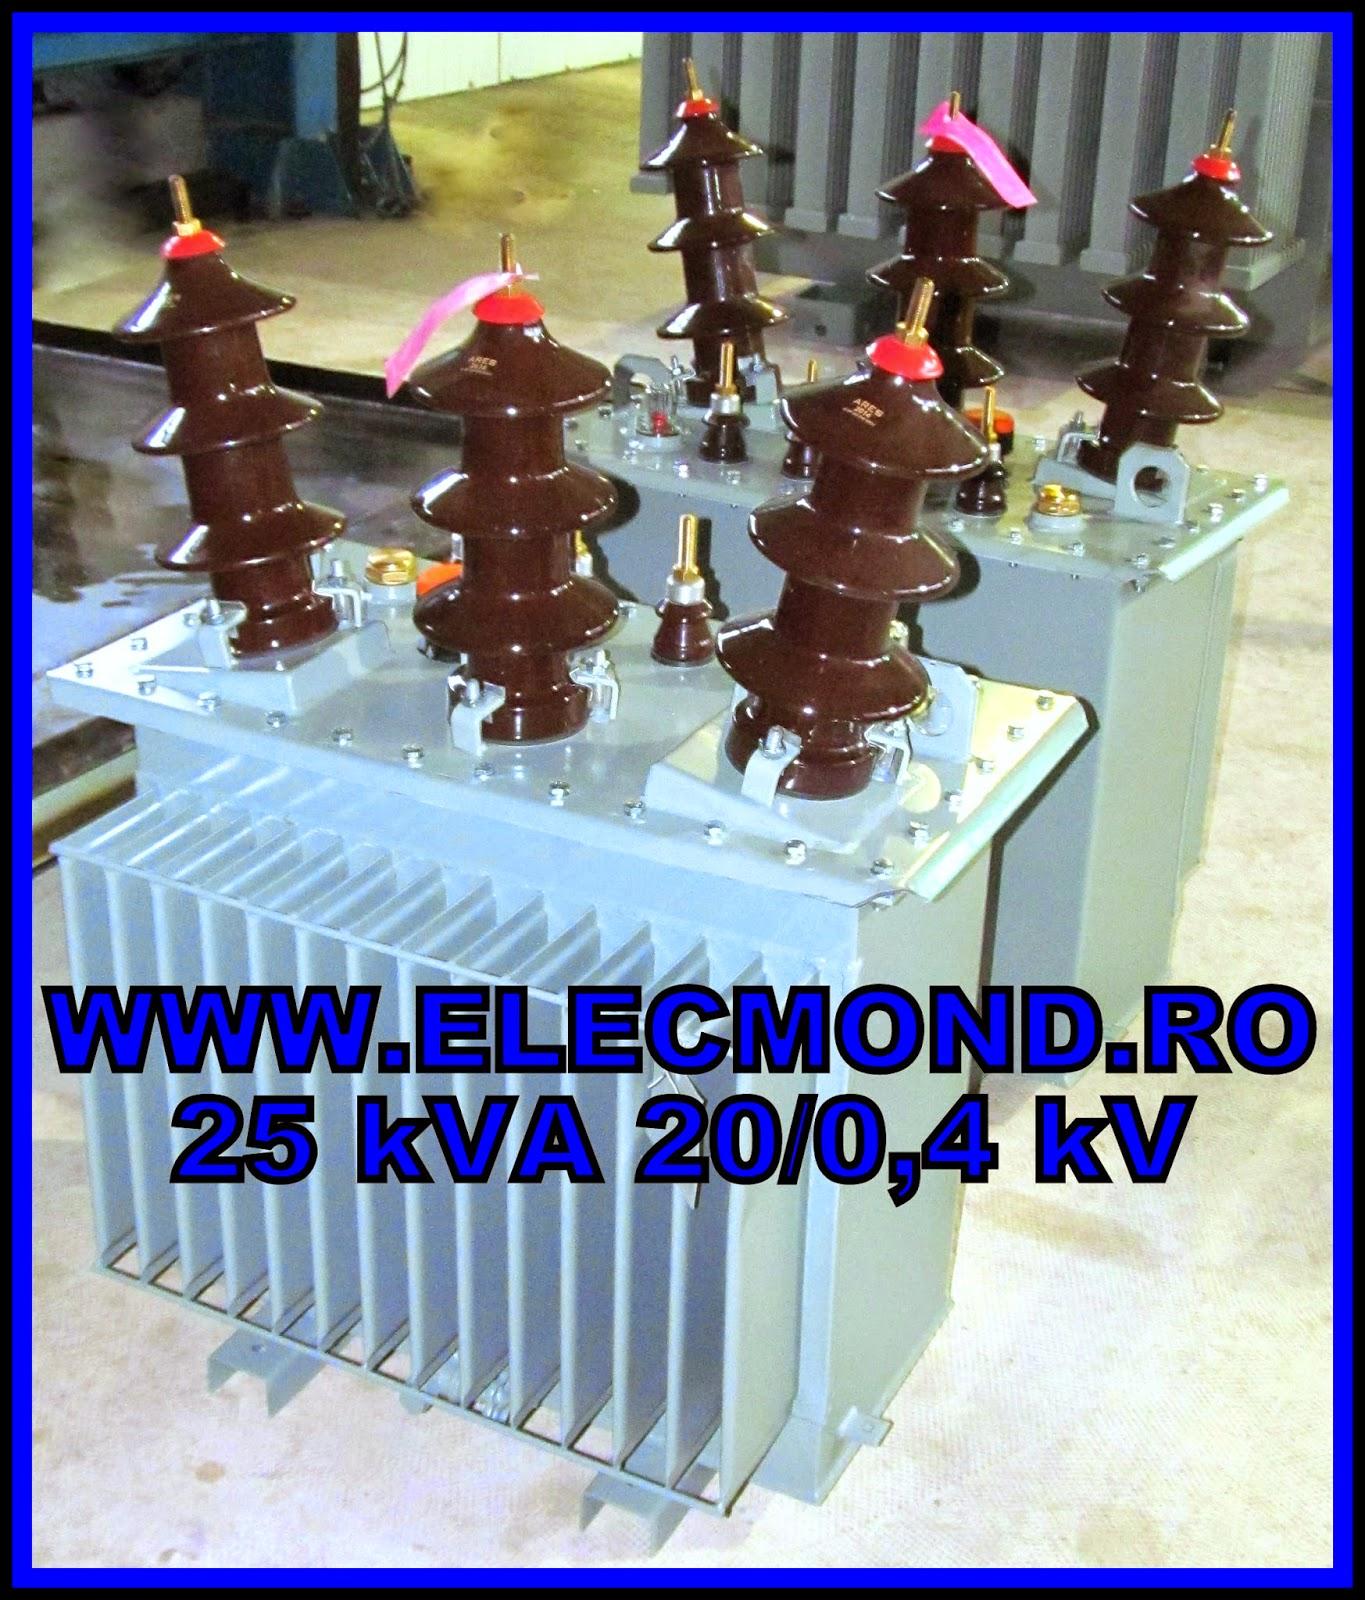 TRANSFORMATOARE SPECIALE , Transformator 40 kVA 0,4/0235kV  , transformator  50kVA 380/460V , Elecmond  , transformatoare 25 kVA 20/0,4kV